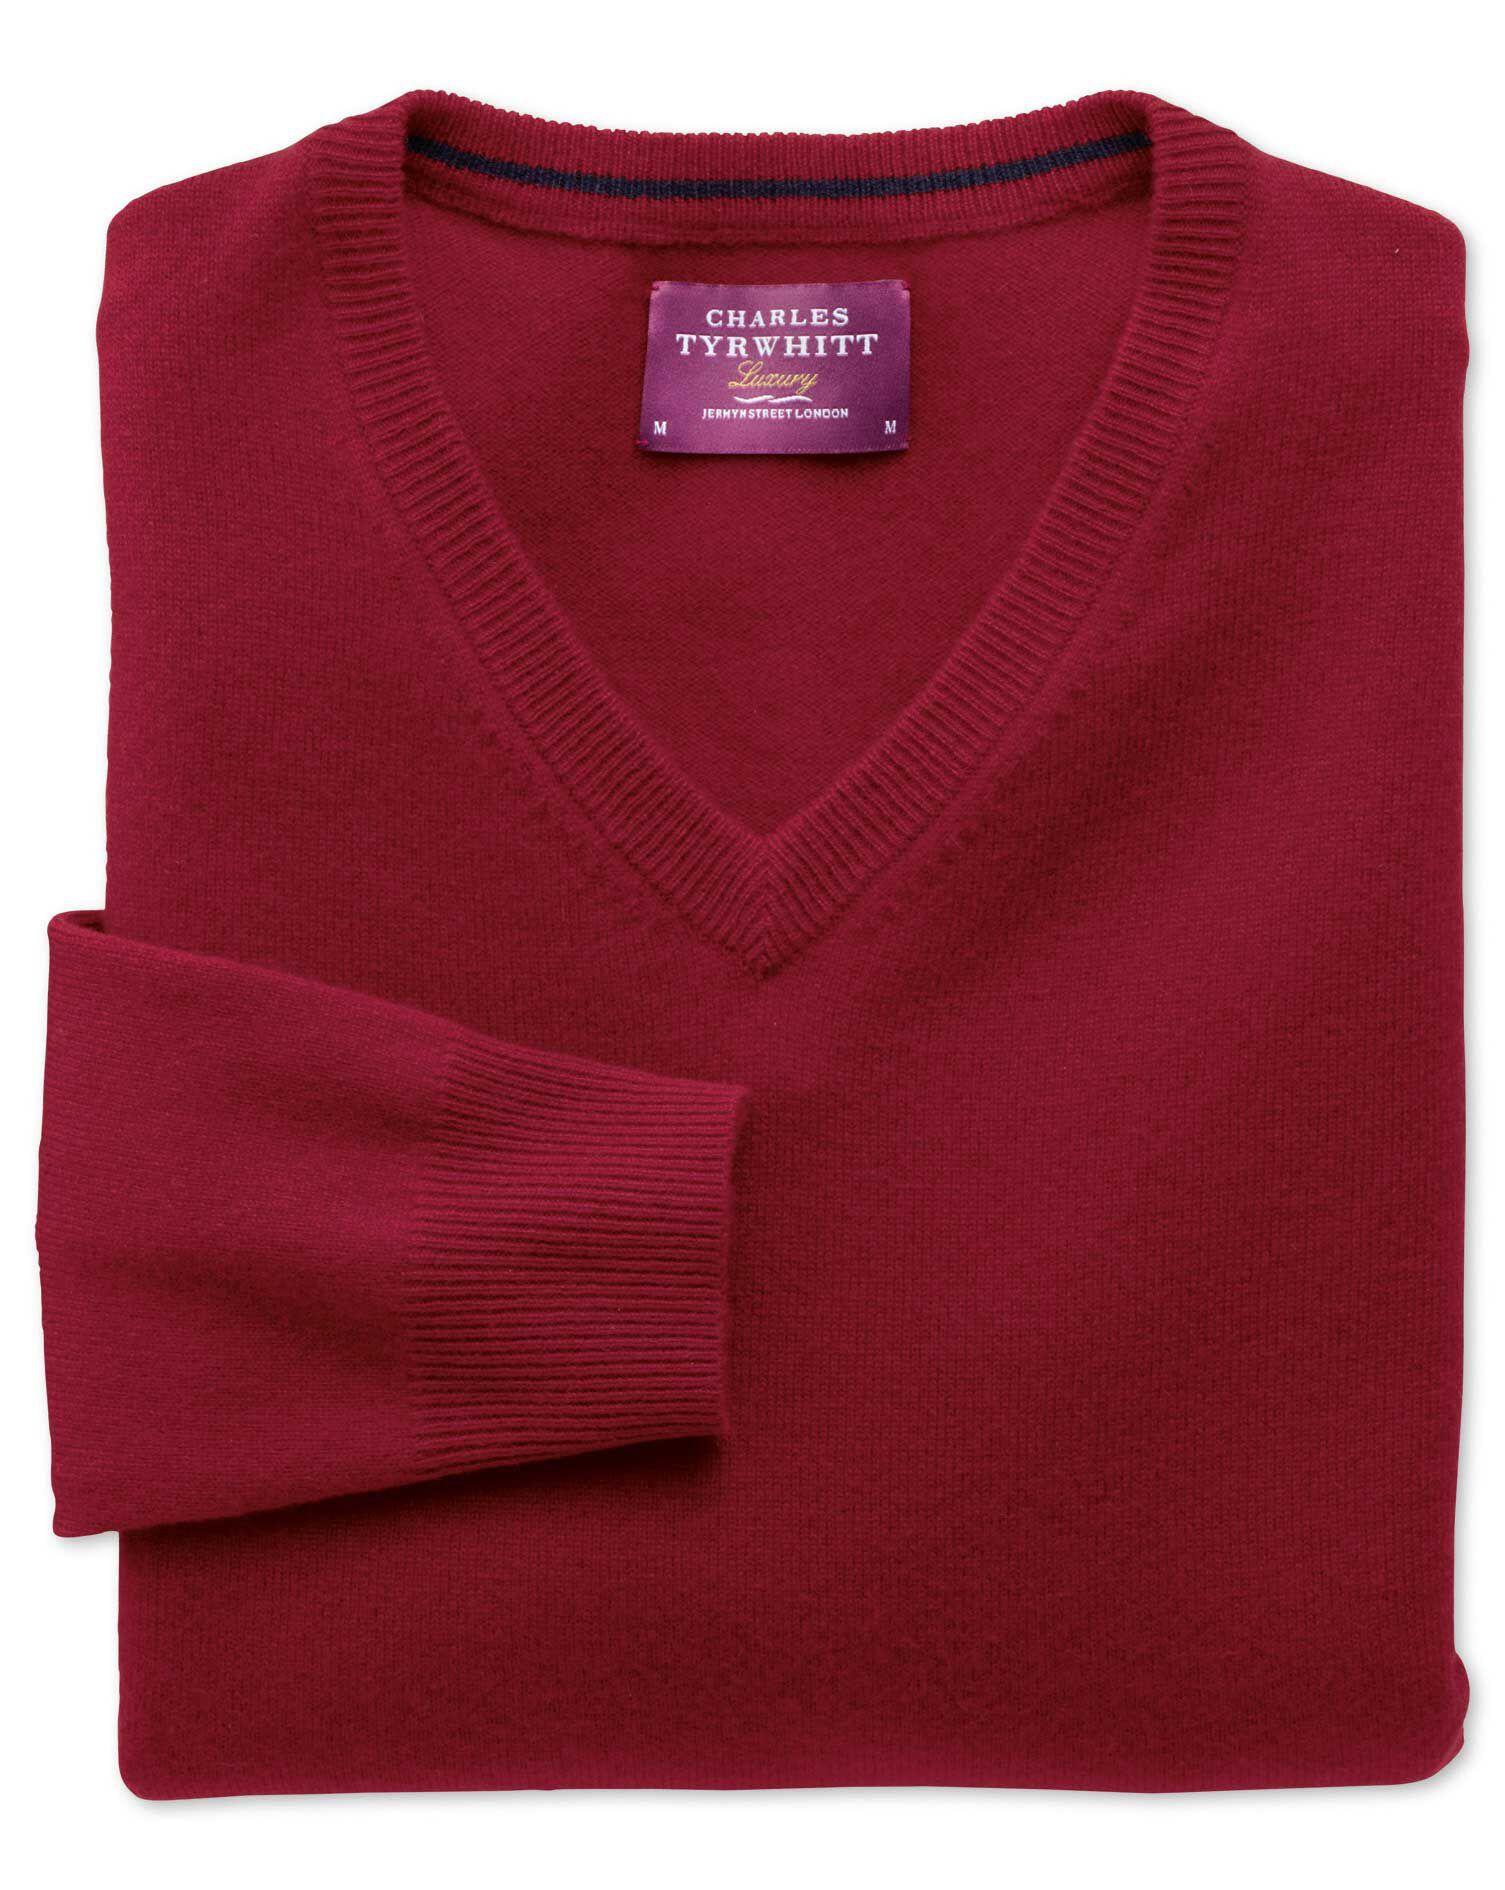 Red Cashmere V-Neck Jumper Size XXL by Charles Tyrwhitt